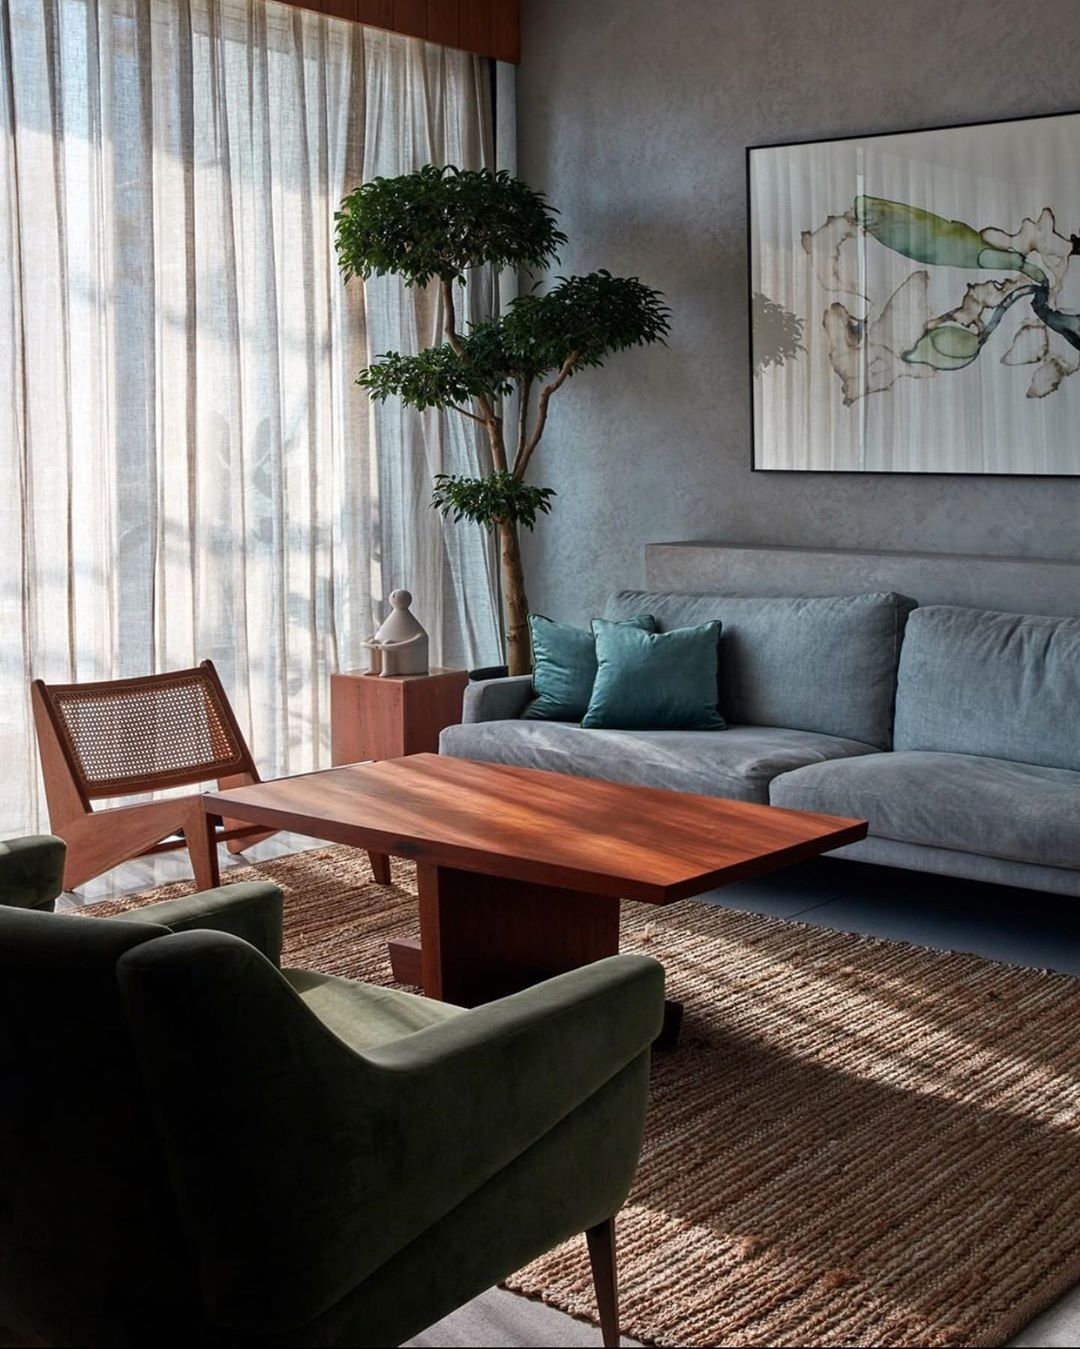 "Marc Costa on Instagram: ""#interiors #interiordesign #design @rayvie #modernism #frenchmodernism #jeanneret #perriand #lecorbusier #prouve #homedecor #decor…"""